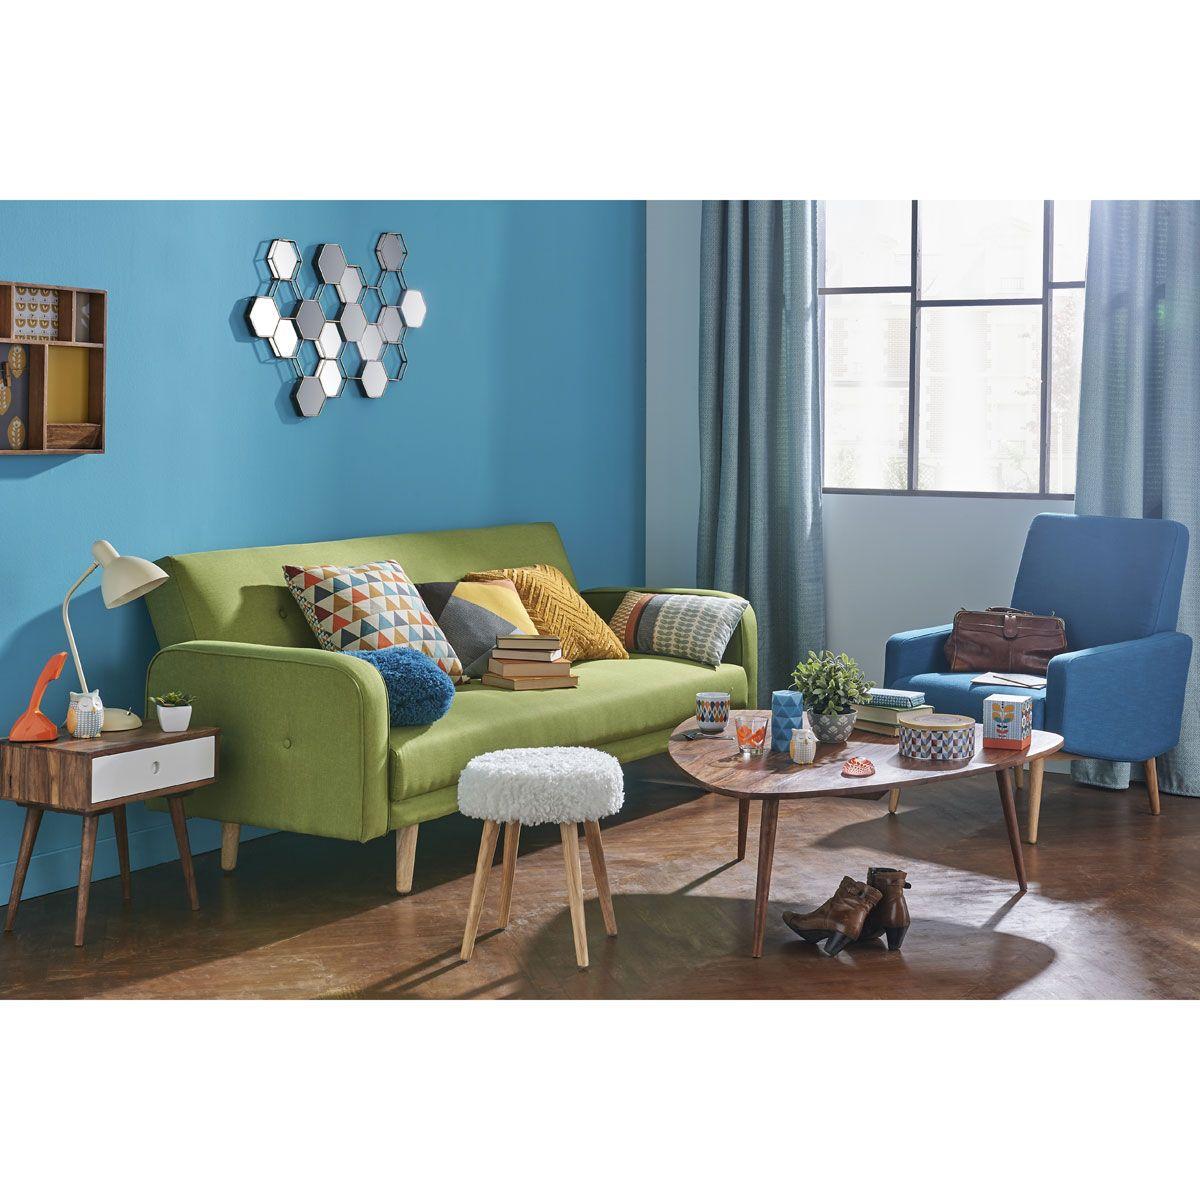 Fauteuil Vintage En Tissu Bleu Petrole Maisons Du Monde Interior Design Living Room Coffee Table Affordable Furniture